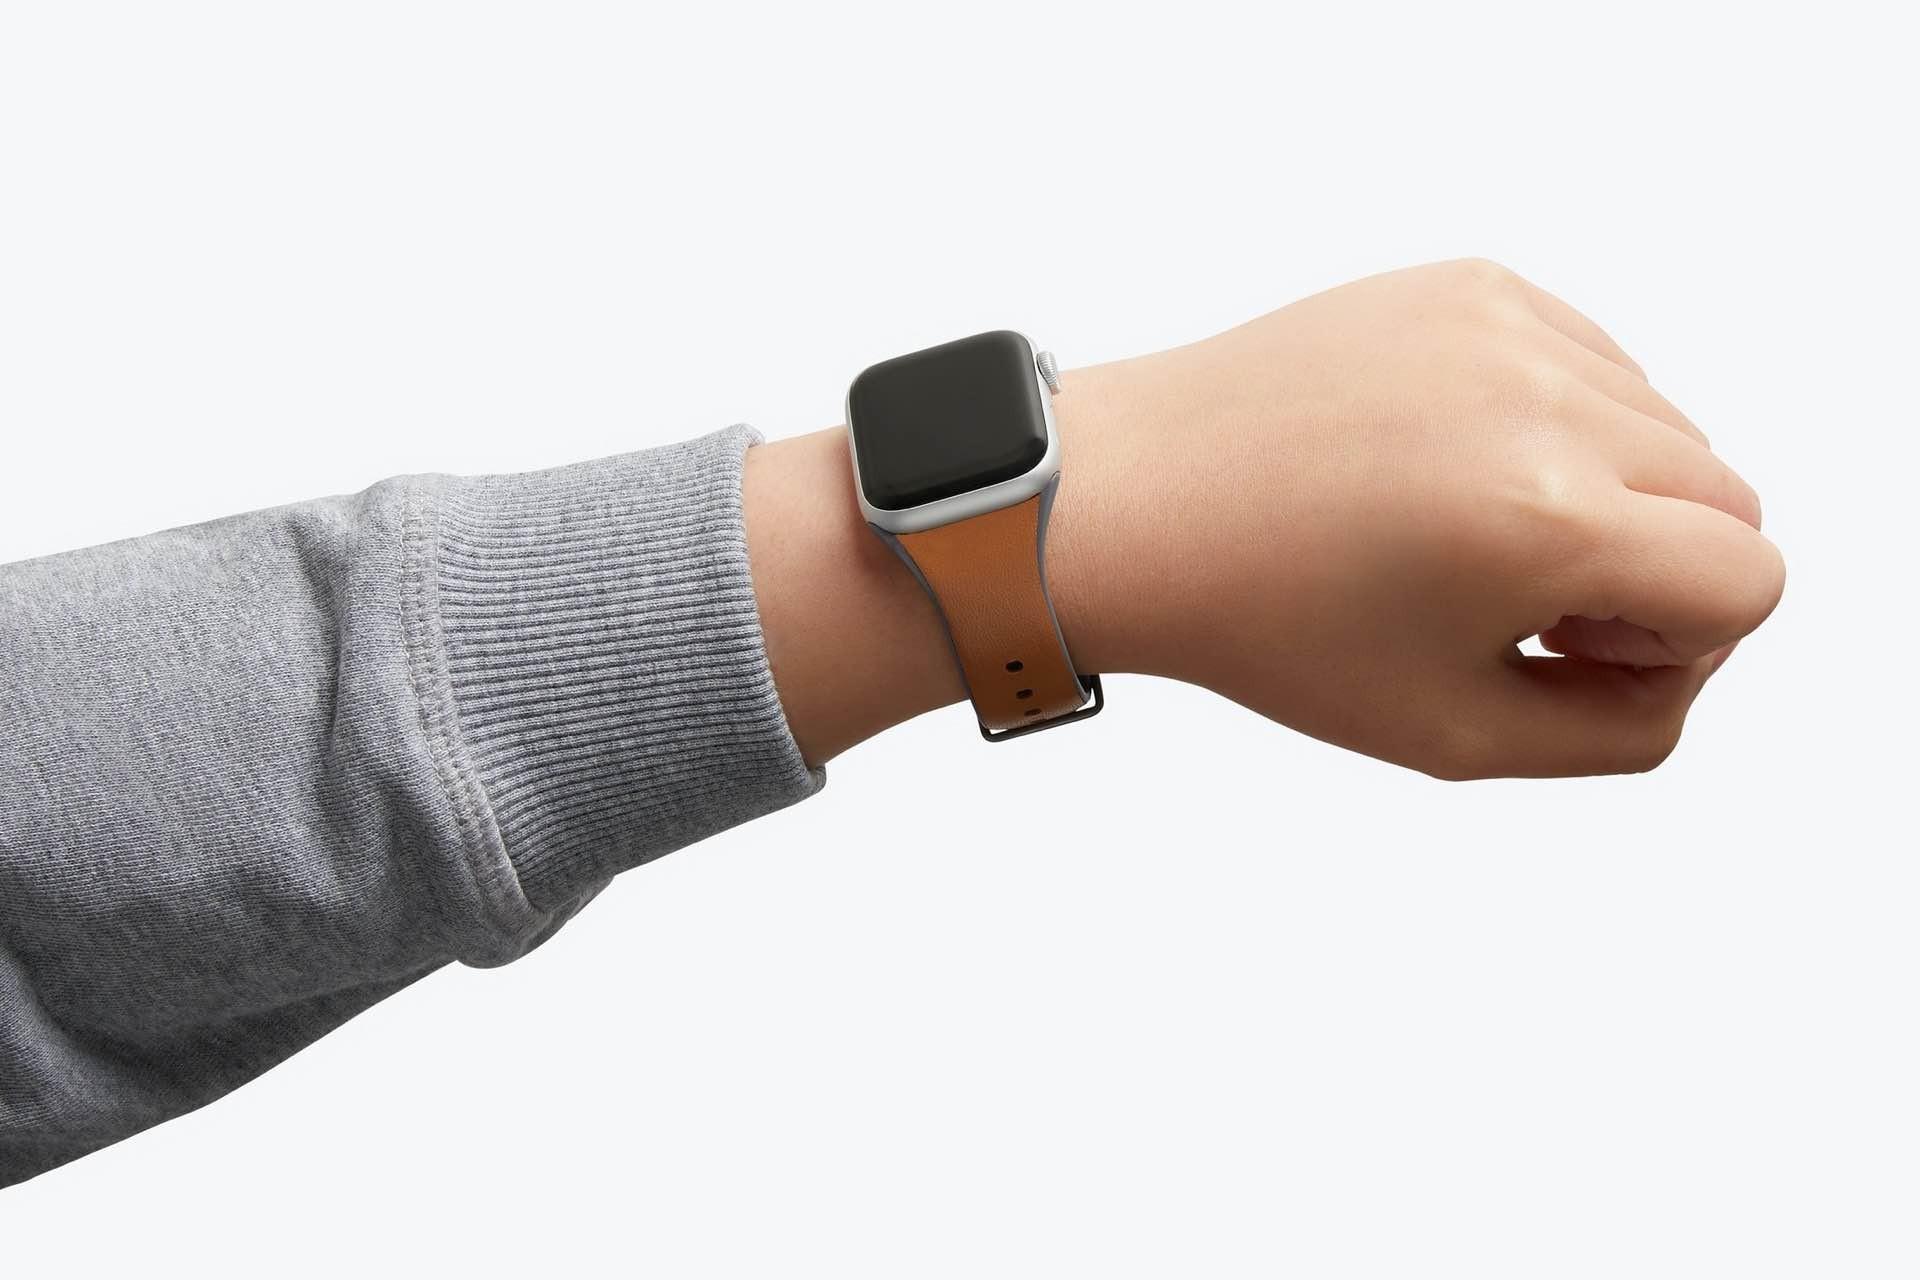 bellroy-leather-polymer-apple-watch-strap